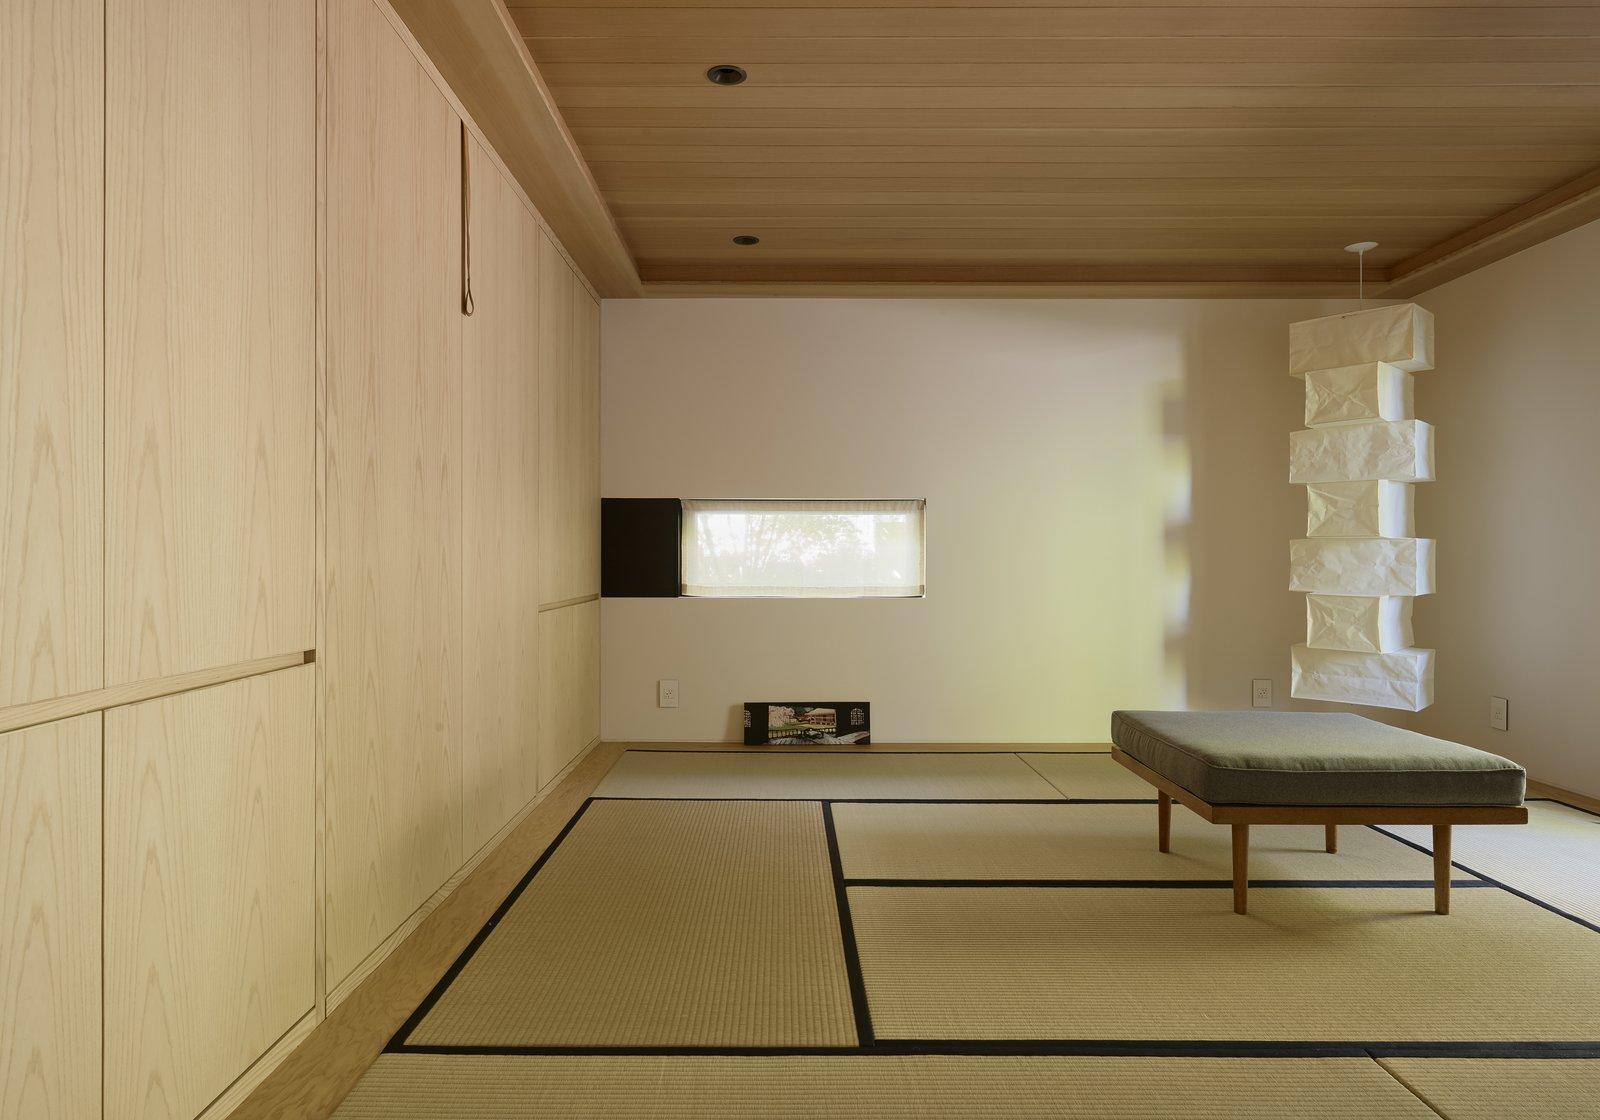 Tatami Mats From Tatami Room